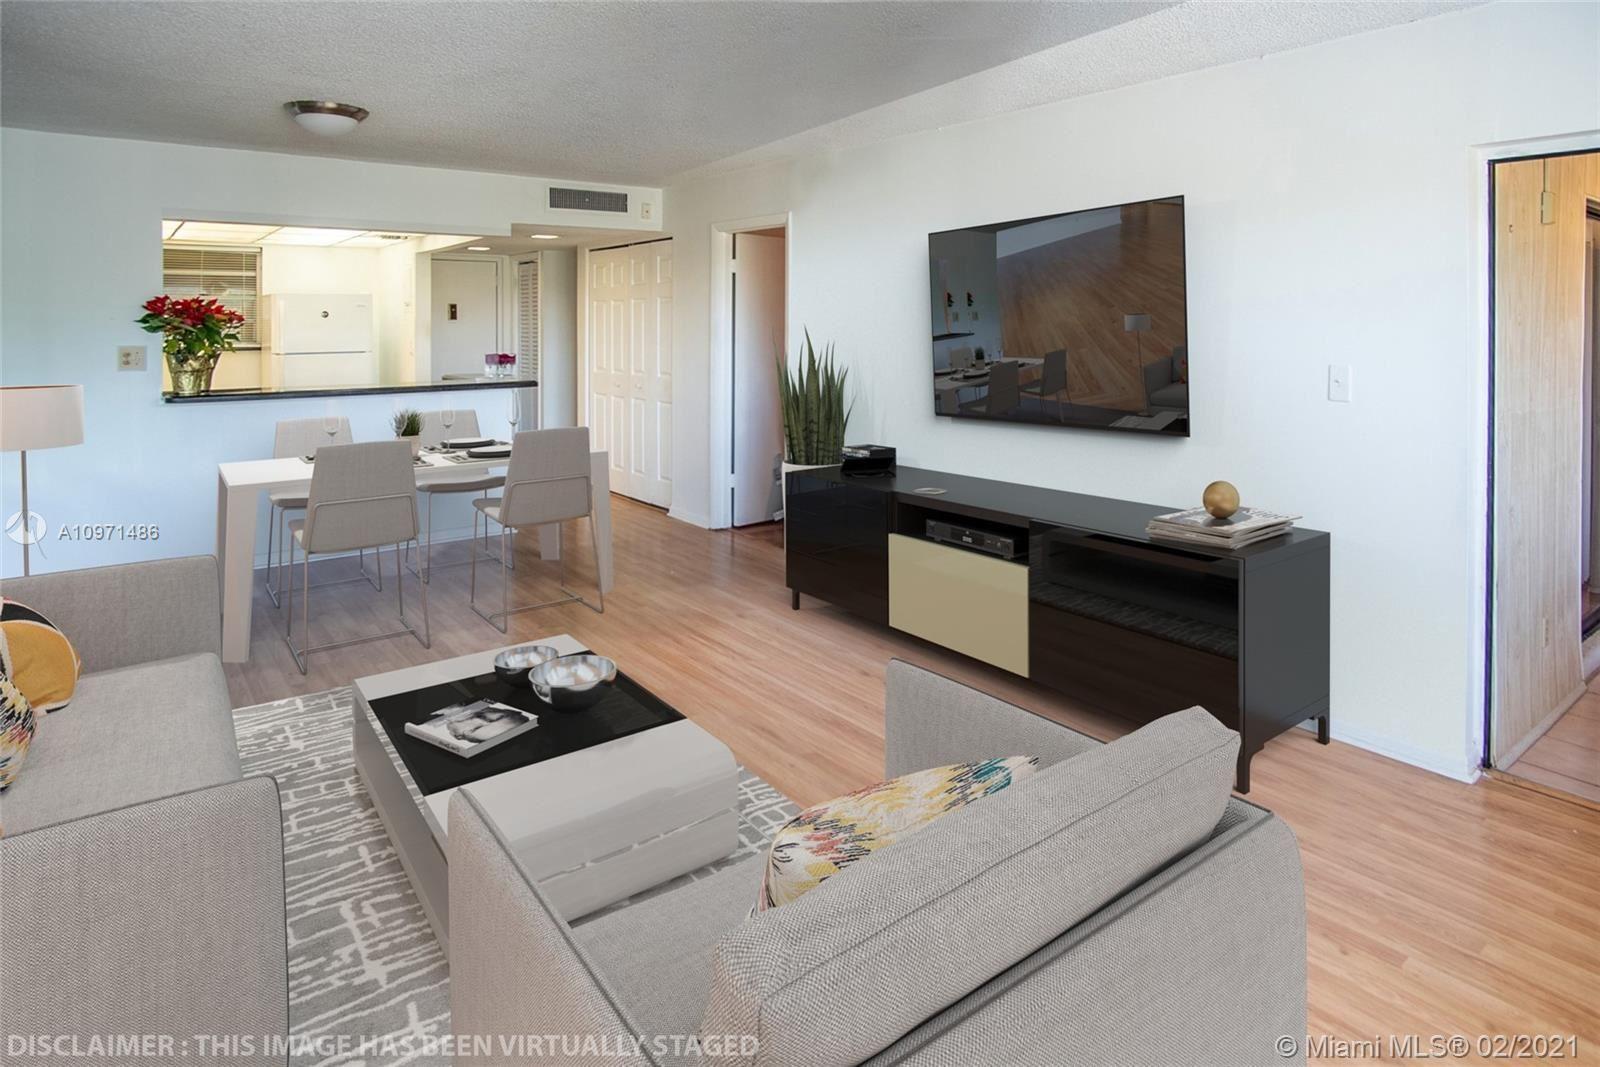 2306 S Cypress Bend Dr #320, Pompano Beach, FL 33069 - #: A10971486